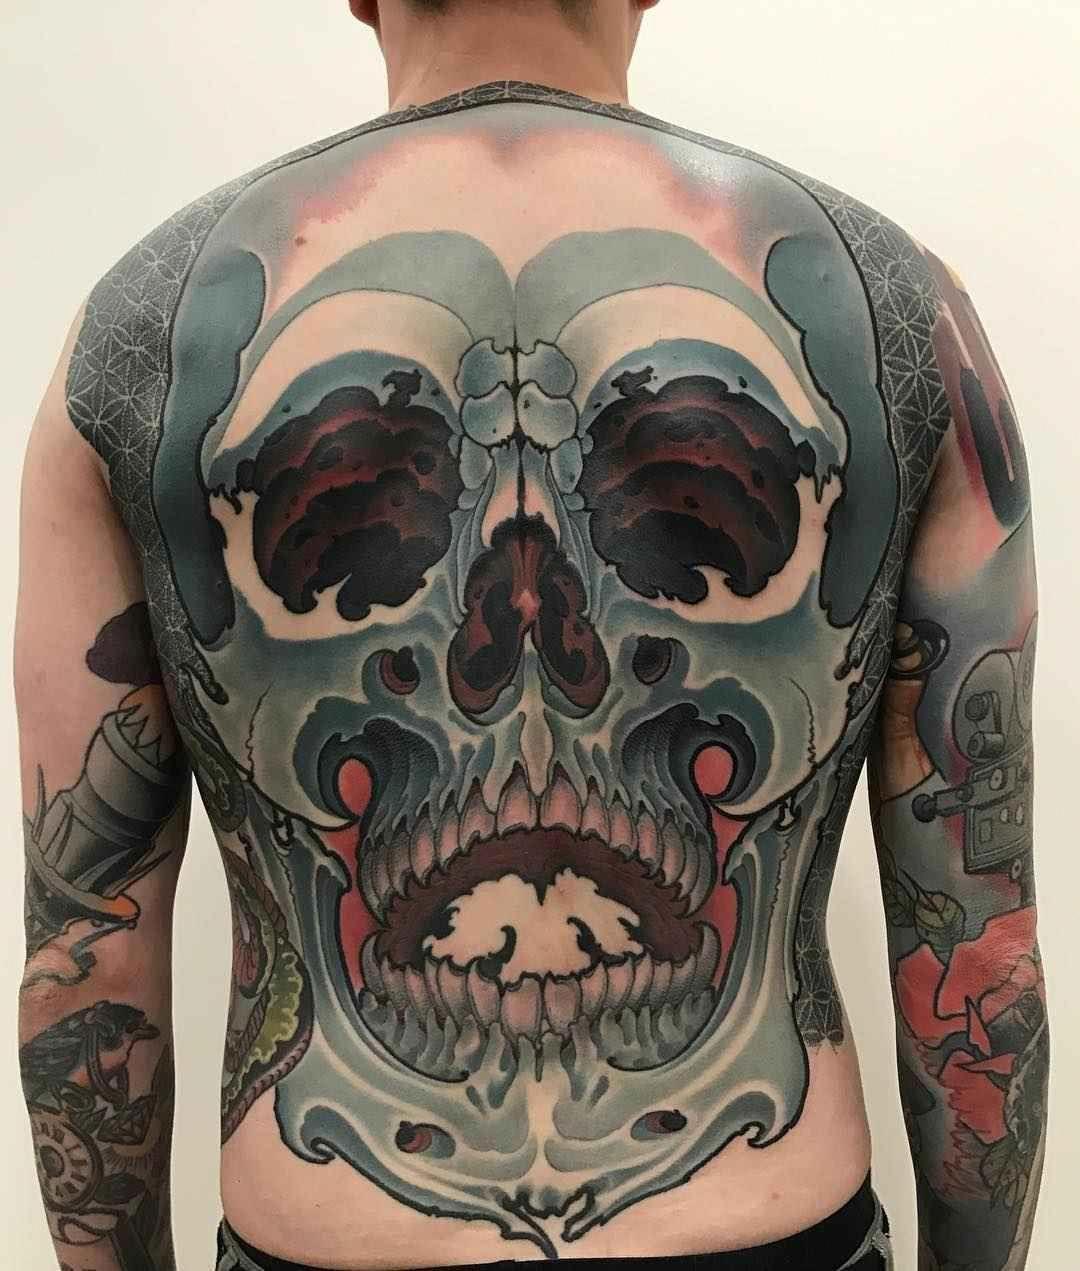 Tattoo Artist Maxim Titanic Kislitsyn Neo Japanese Tattoo Exclusive Interview Inkppl Tattoo Magazine Moscow Russia